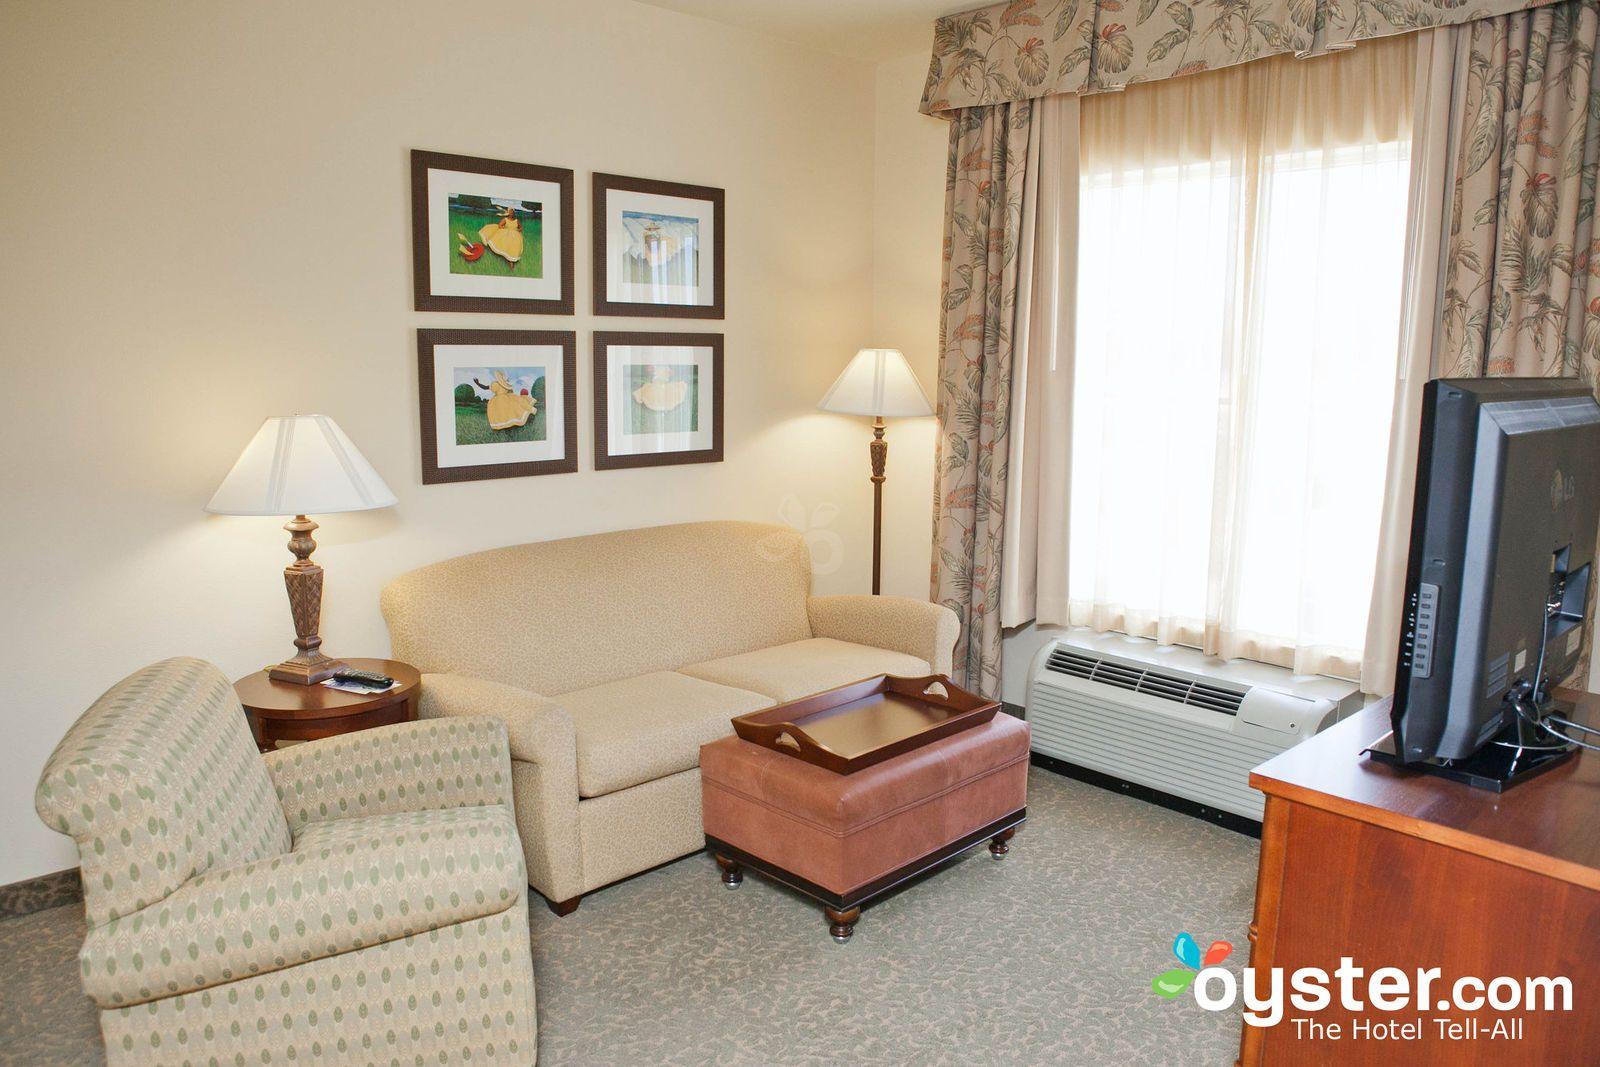 The Two Bedroom Suite Homewood Suites Hilton Charleston Studio King Queen